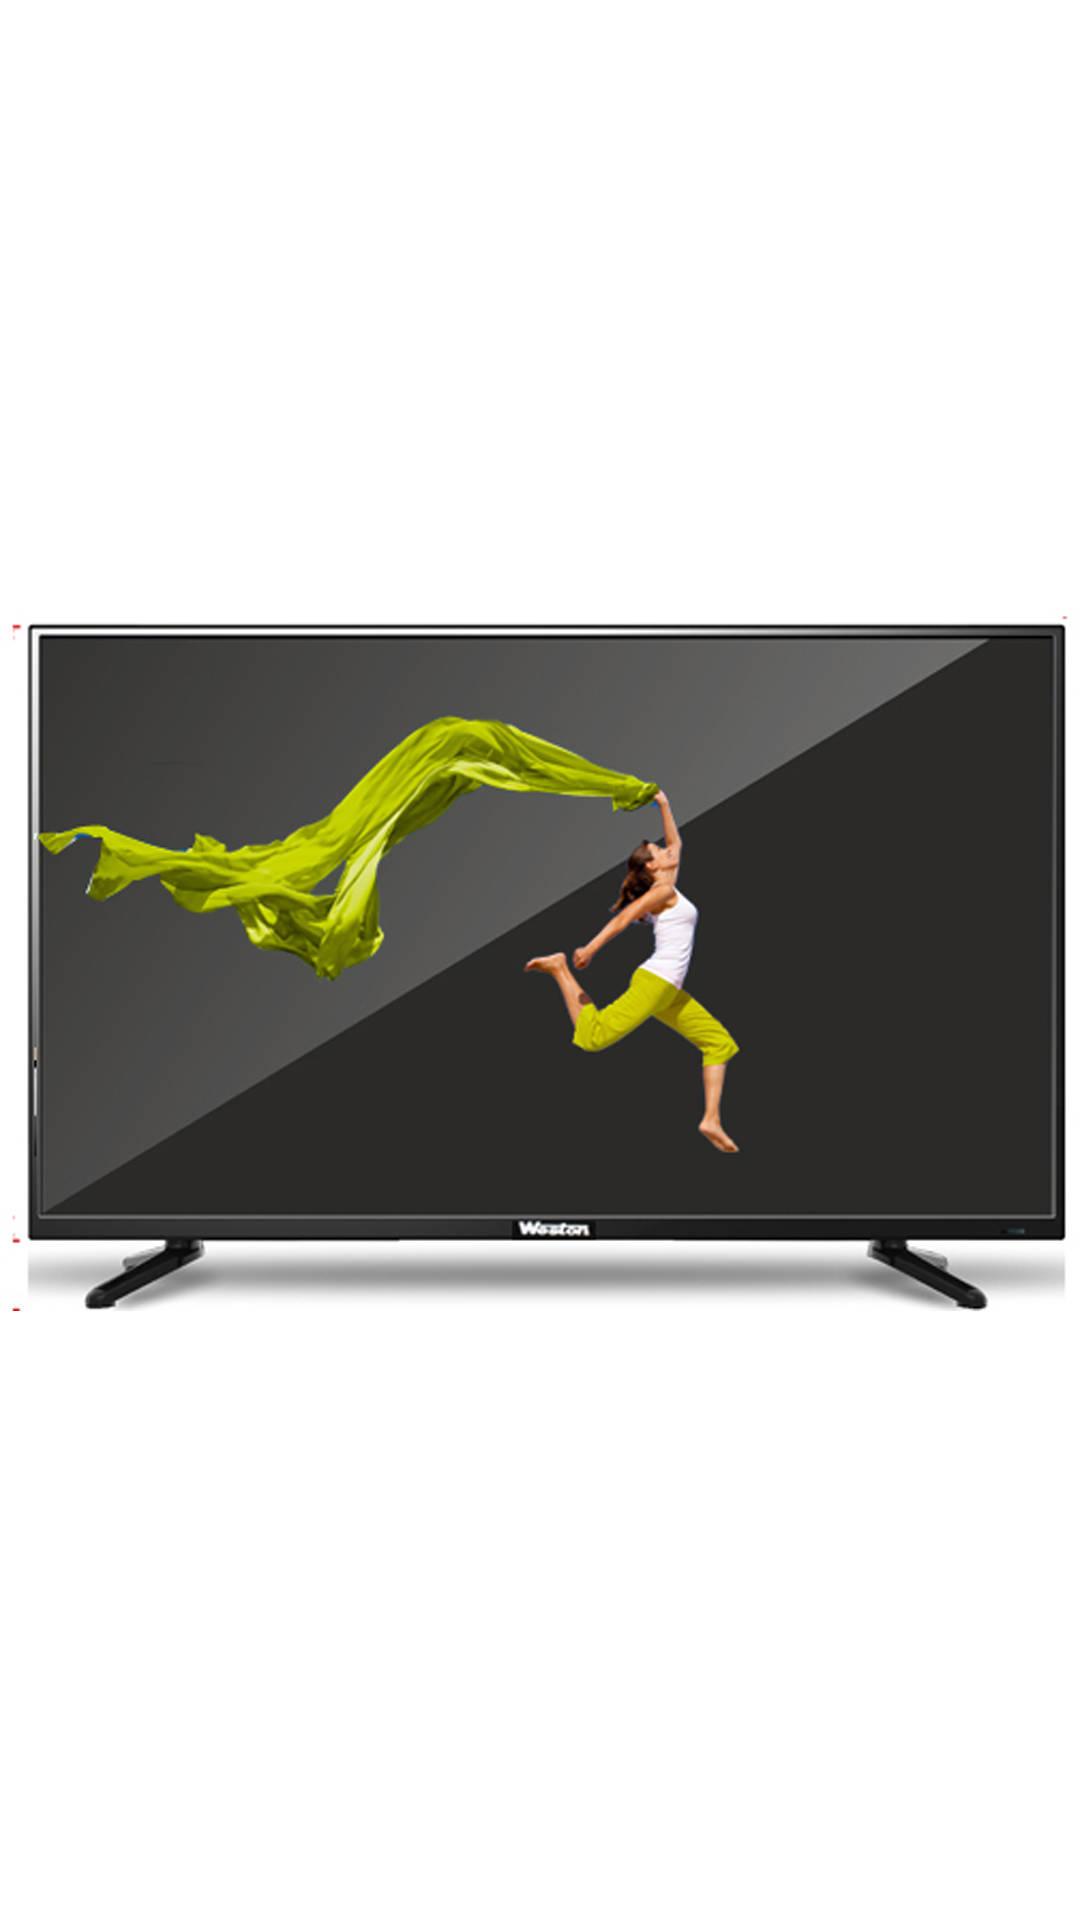 Weston WEL-3200 81 cm (32) LED TV (HD Ready) Image